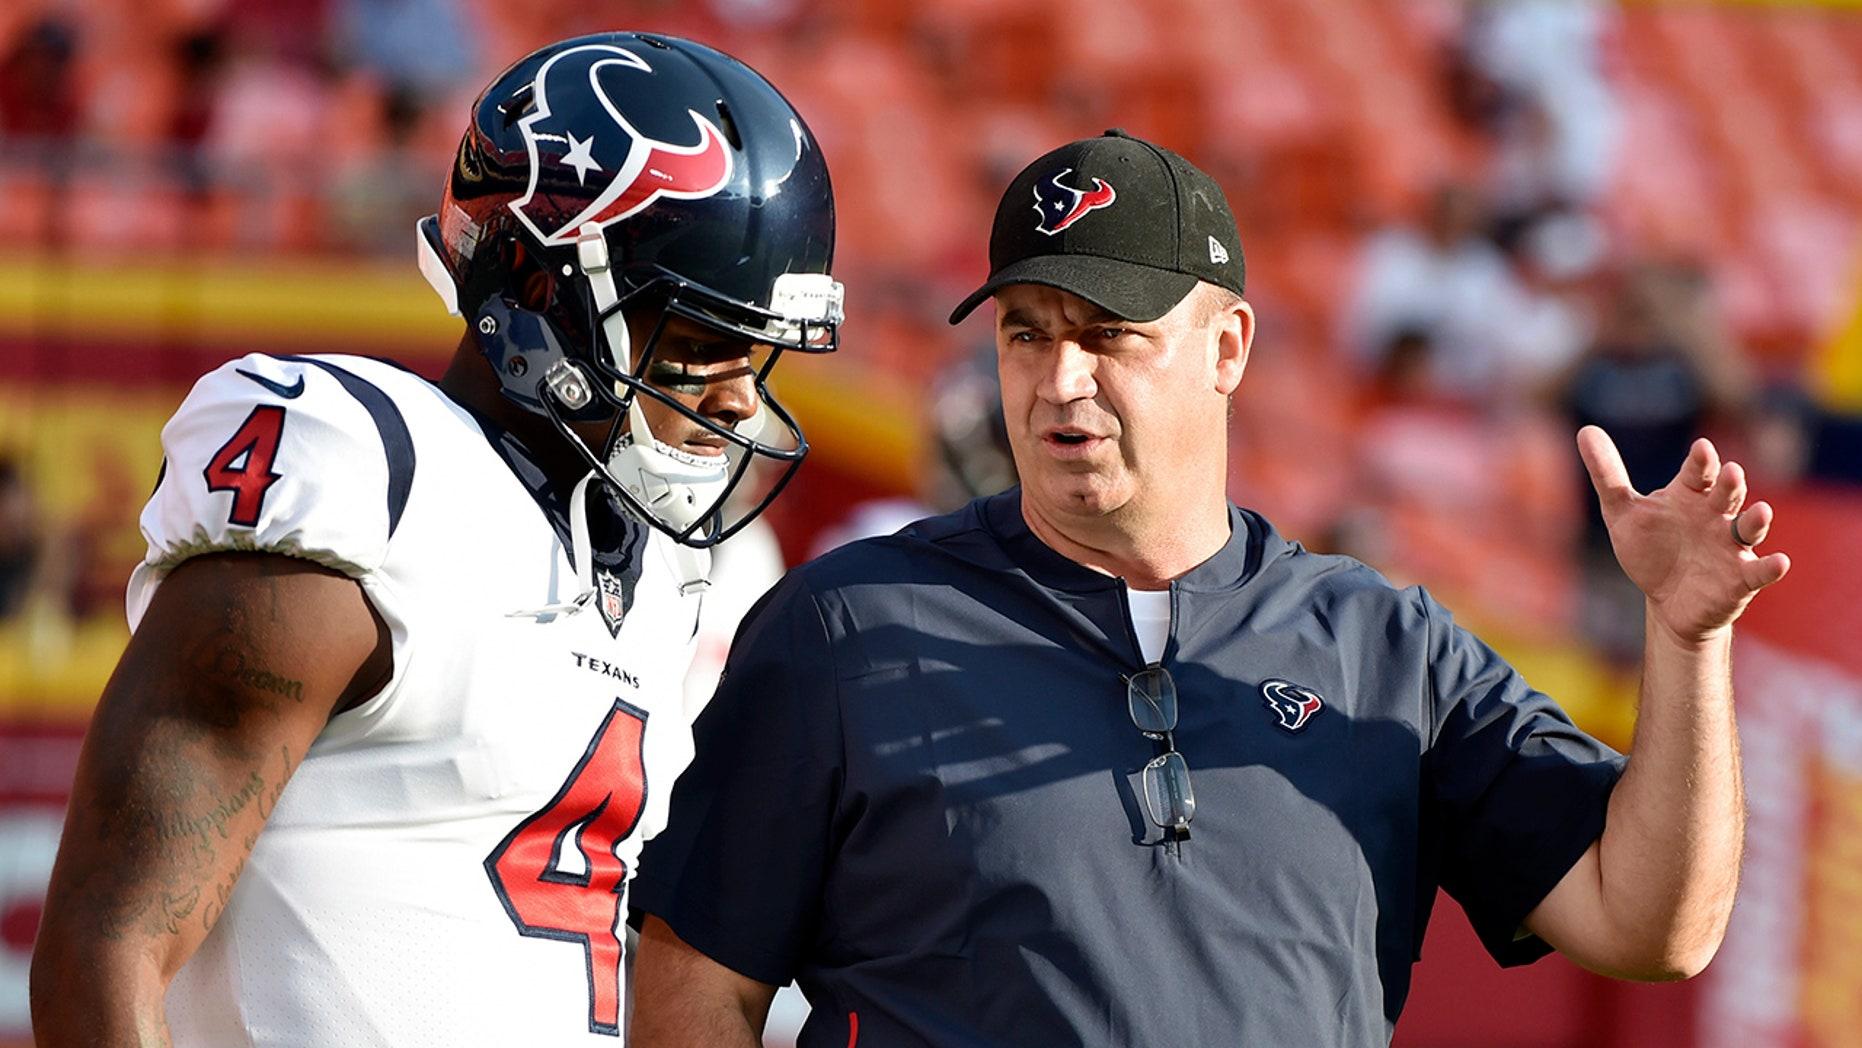 Texans head coach Bill O'Brien, right, defended quarterback Deshaun Watson